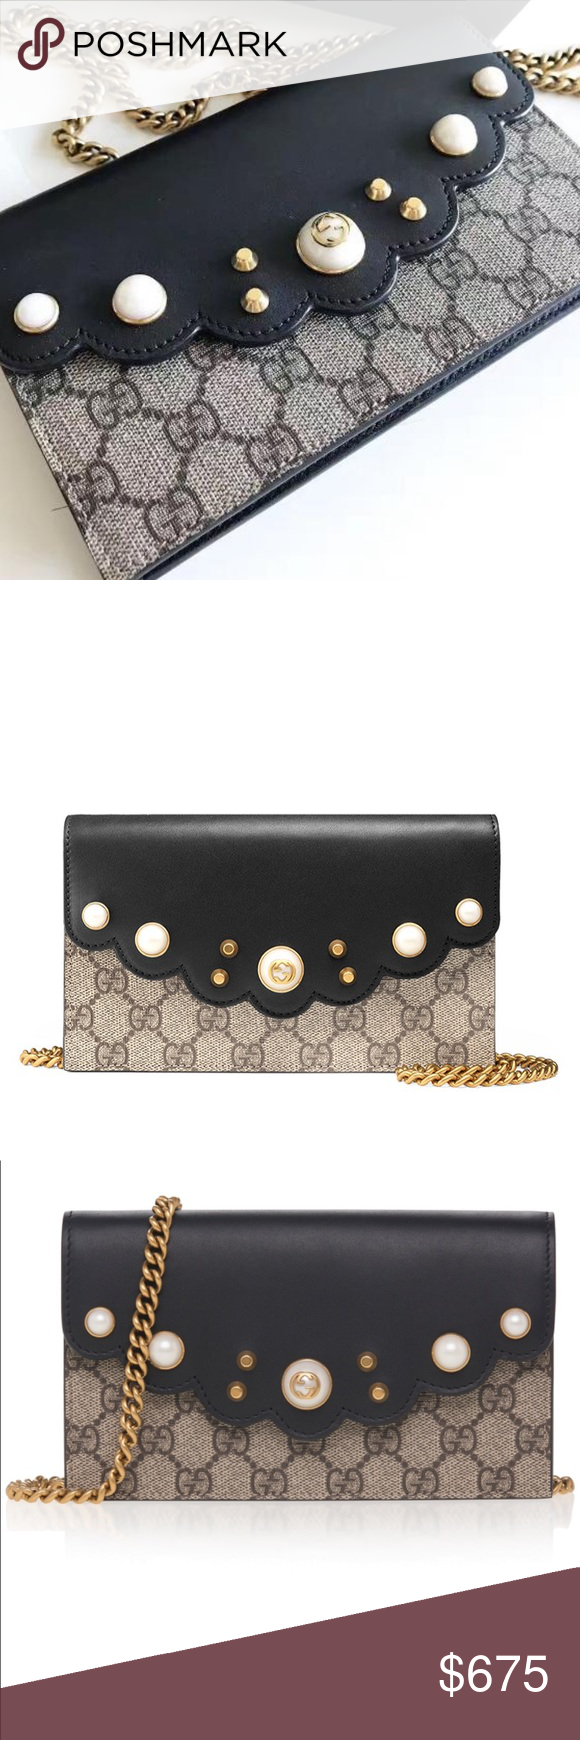 78a32c5ad34cc3 Authentic Gucci Peony GG Supreme Pearl Wallet Authentic Gucci Peony GG  Supreme Pearl Wallet on Chain